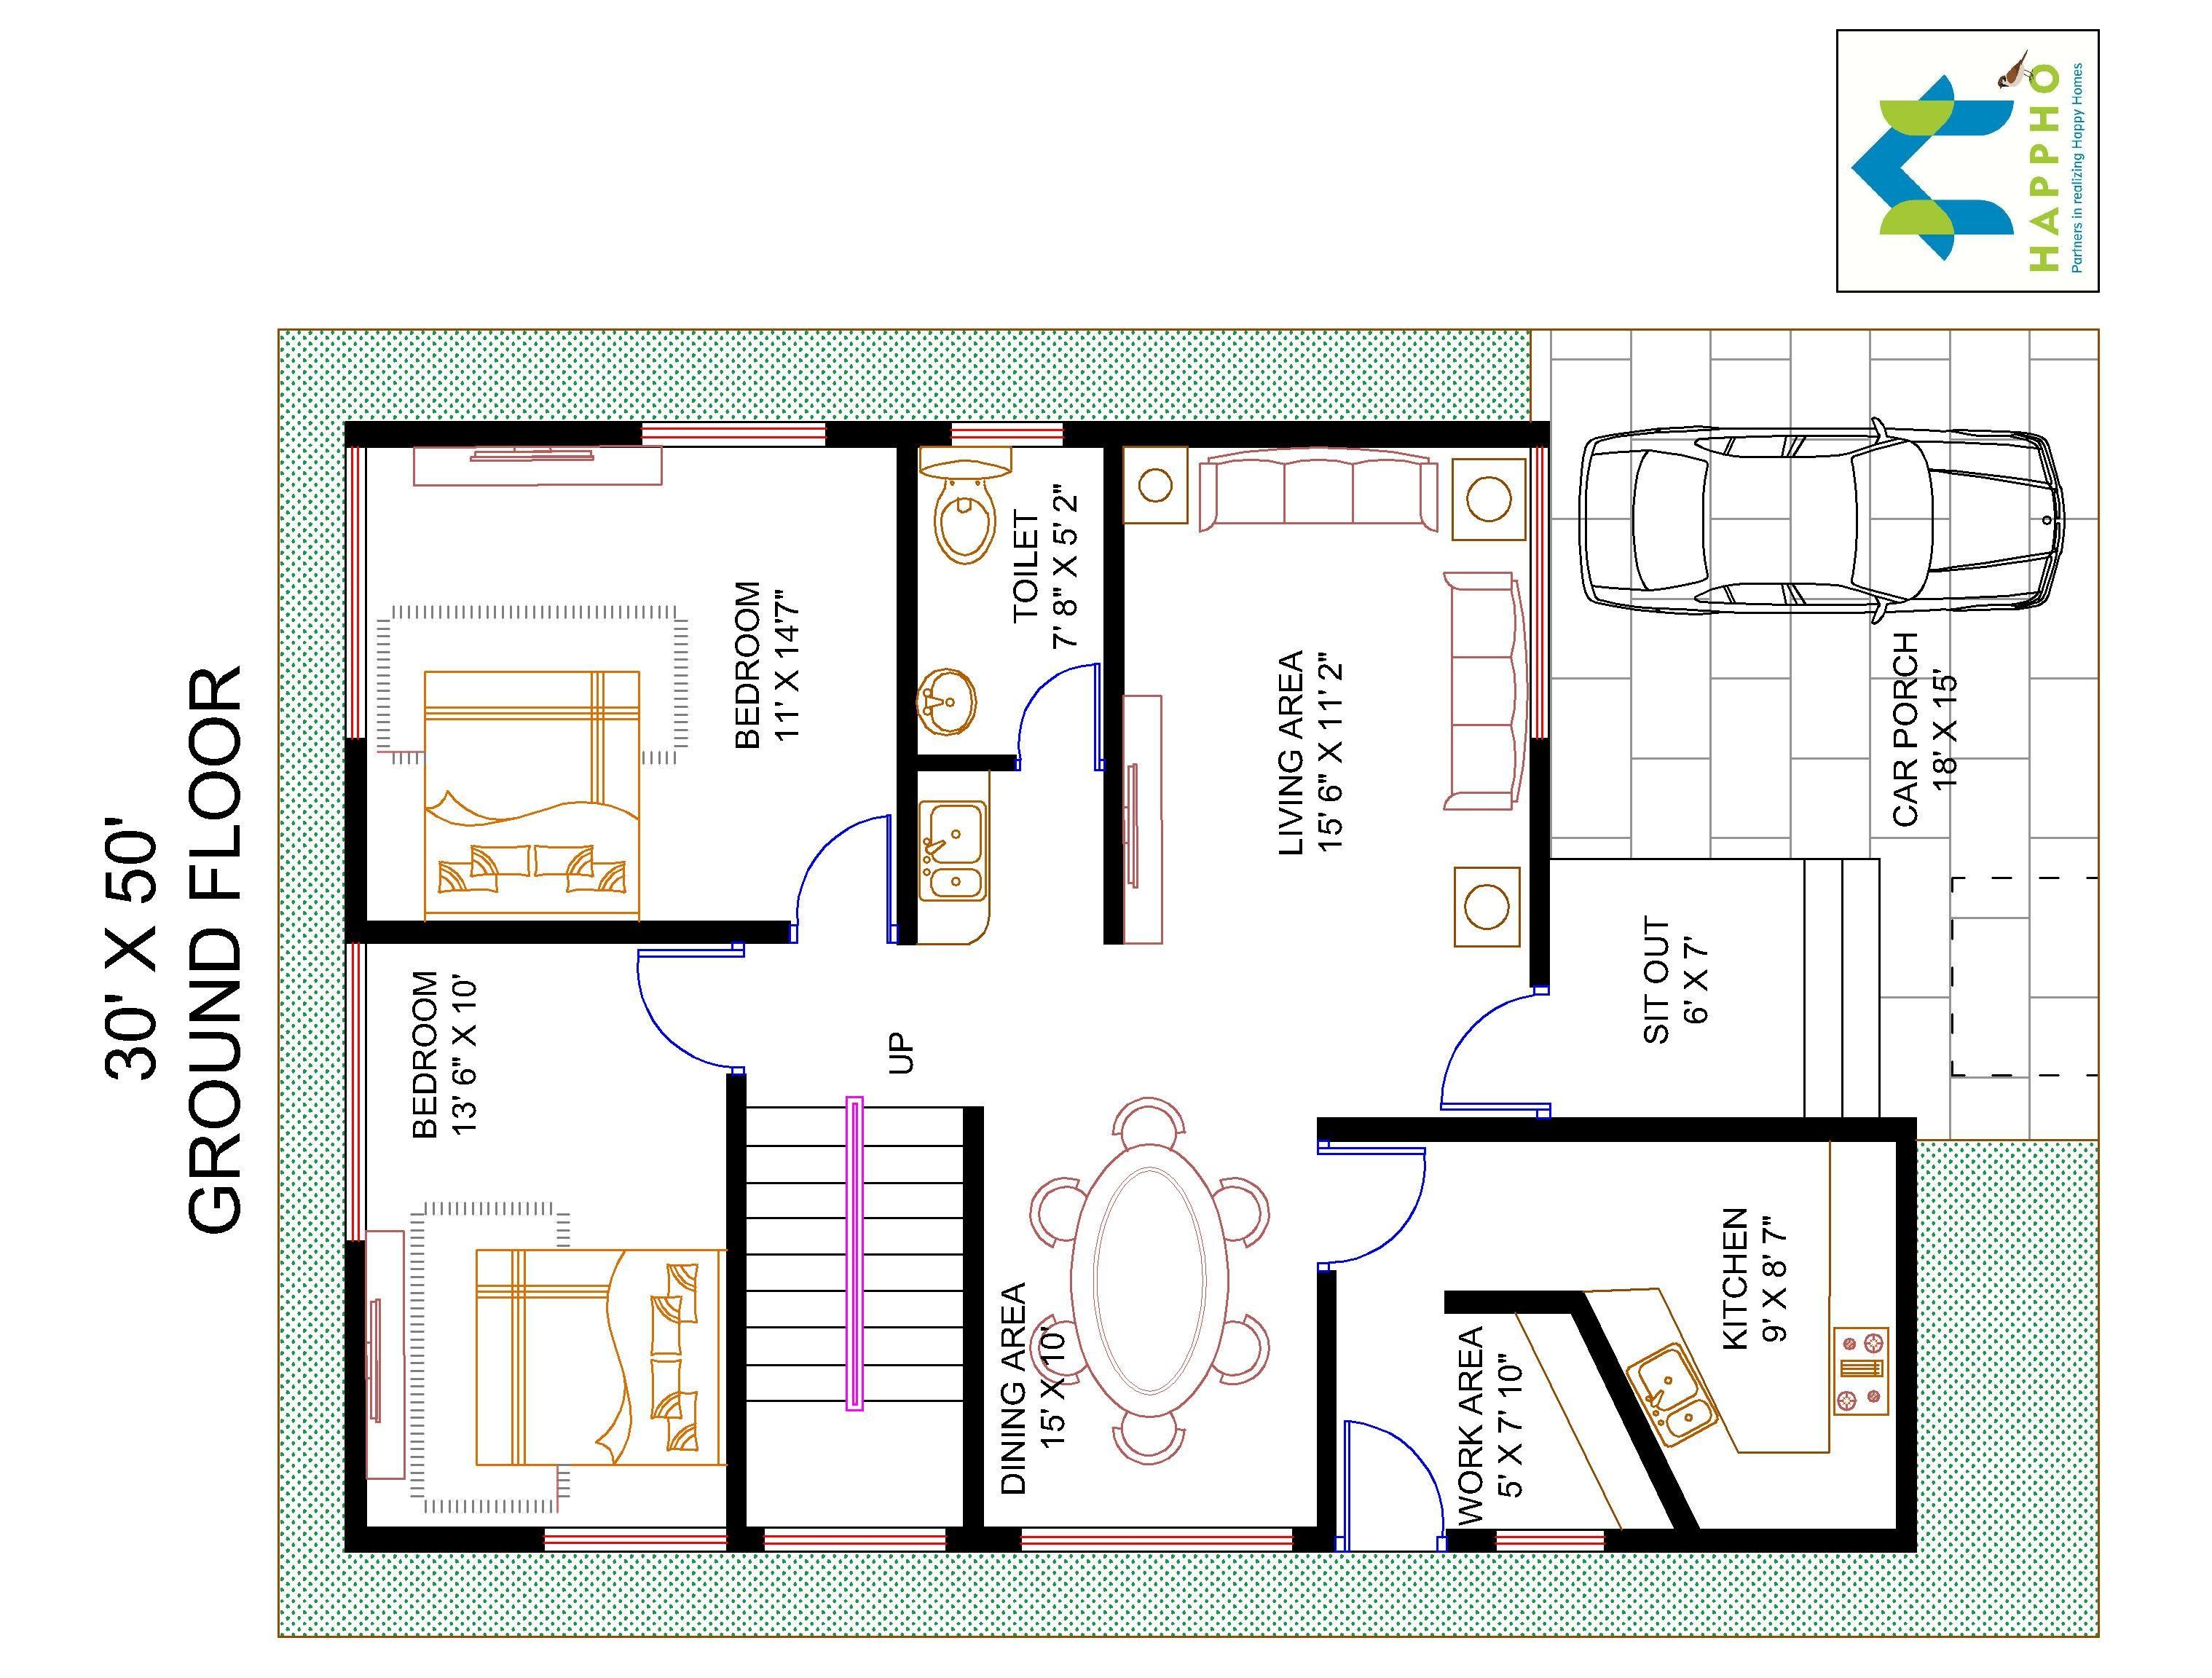 Floor plan for 30 x 50 plot 4 bhk 1500 square feet 166 for 1500 sq ft duplex house plans